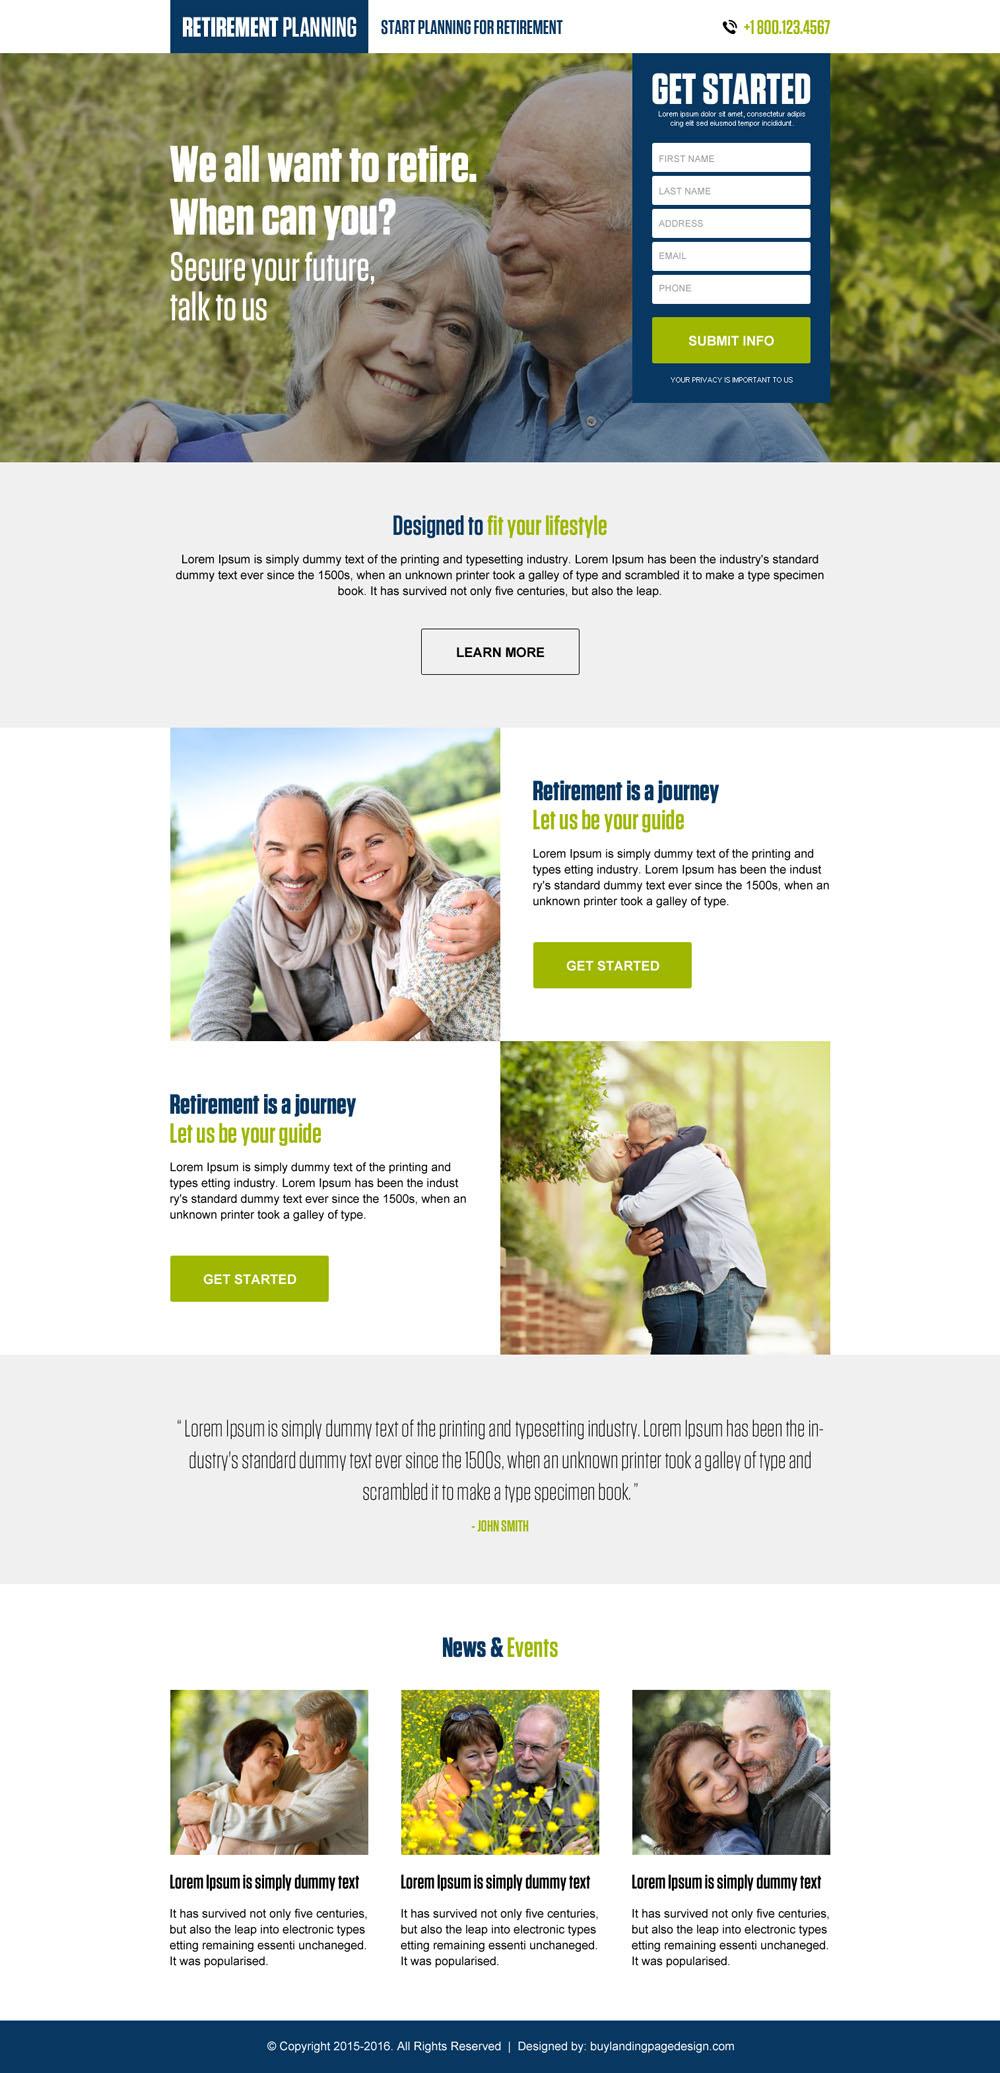 retirement-planning-lead-capture-converting-landing-page-design-template-001